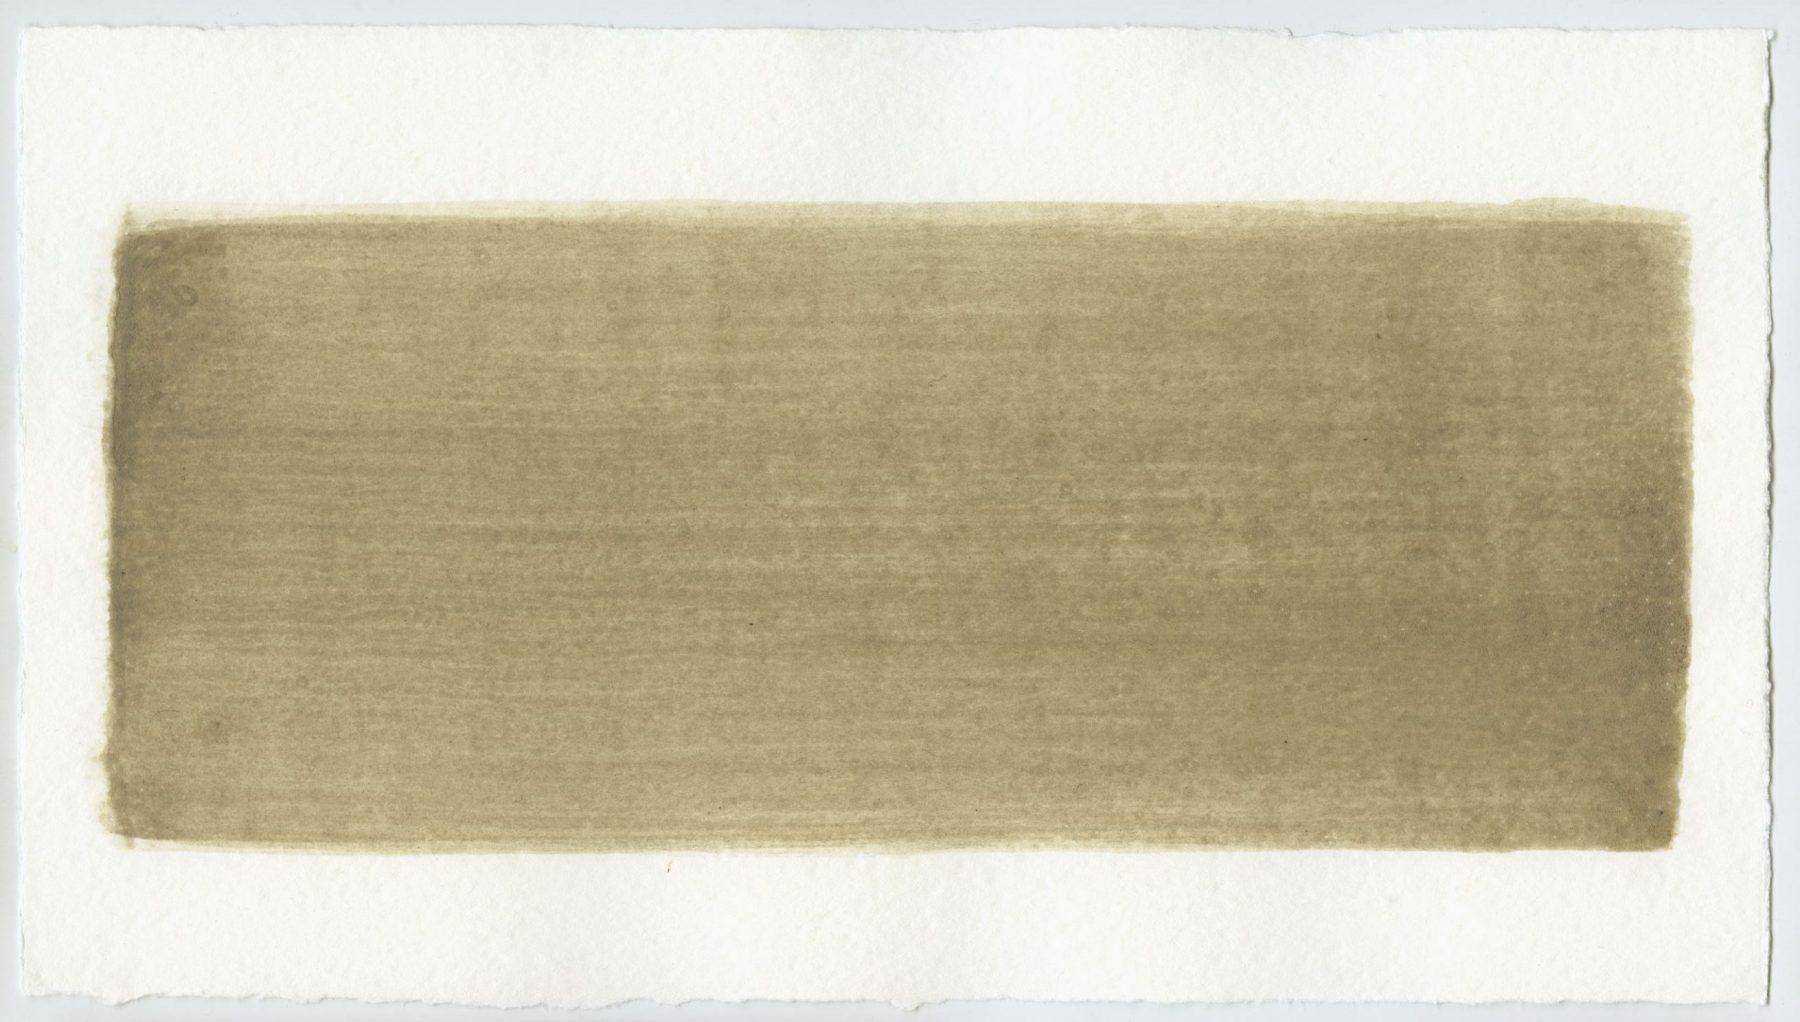 Brush stroke no. 13 - Selfmade pigment: Perekker grijs